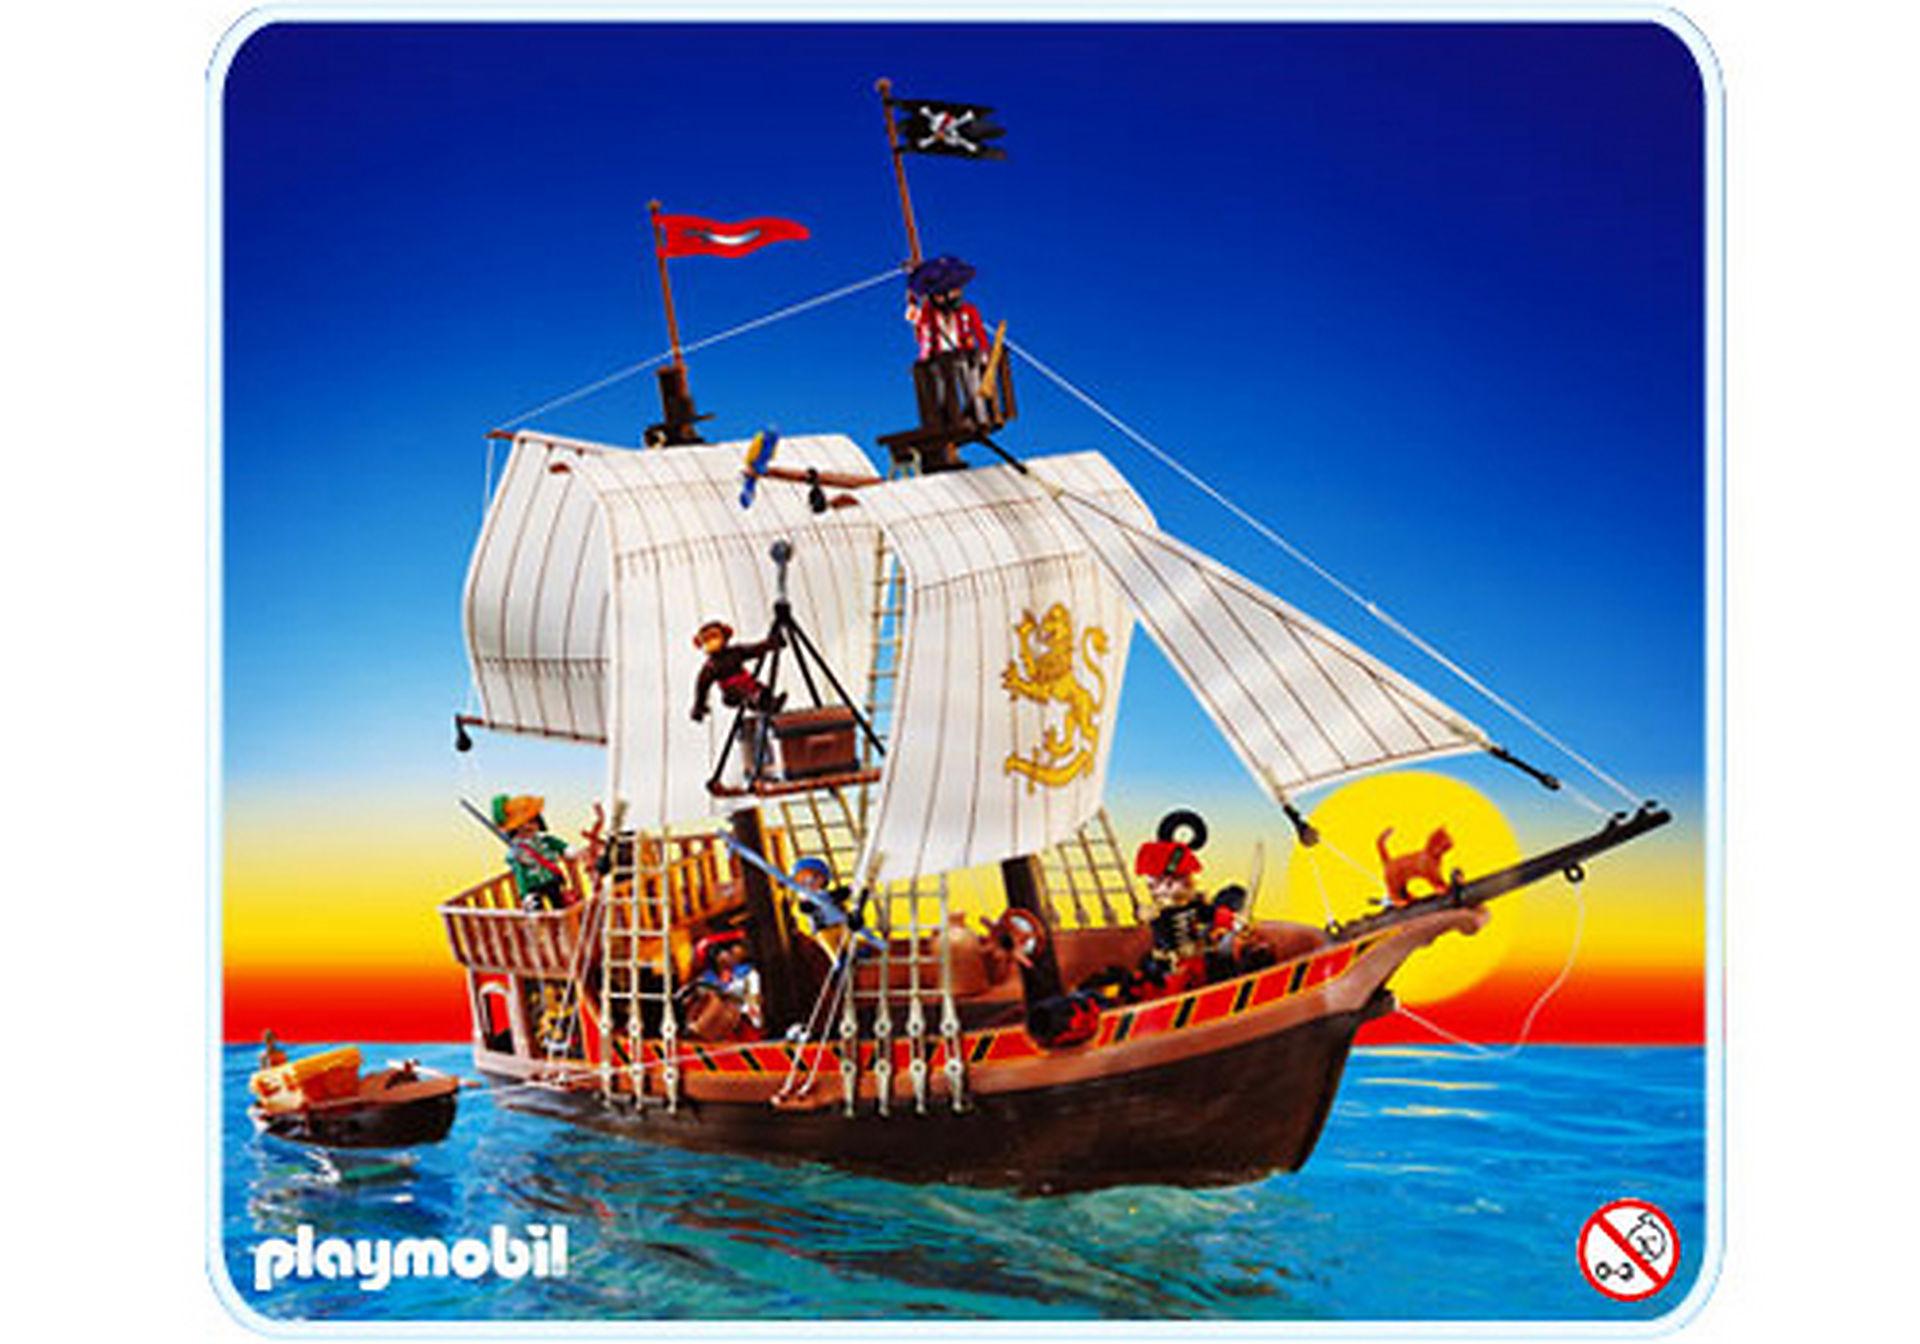 3750-A Piratenschiff zoom image1